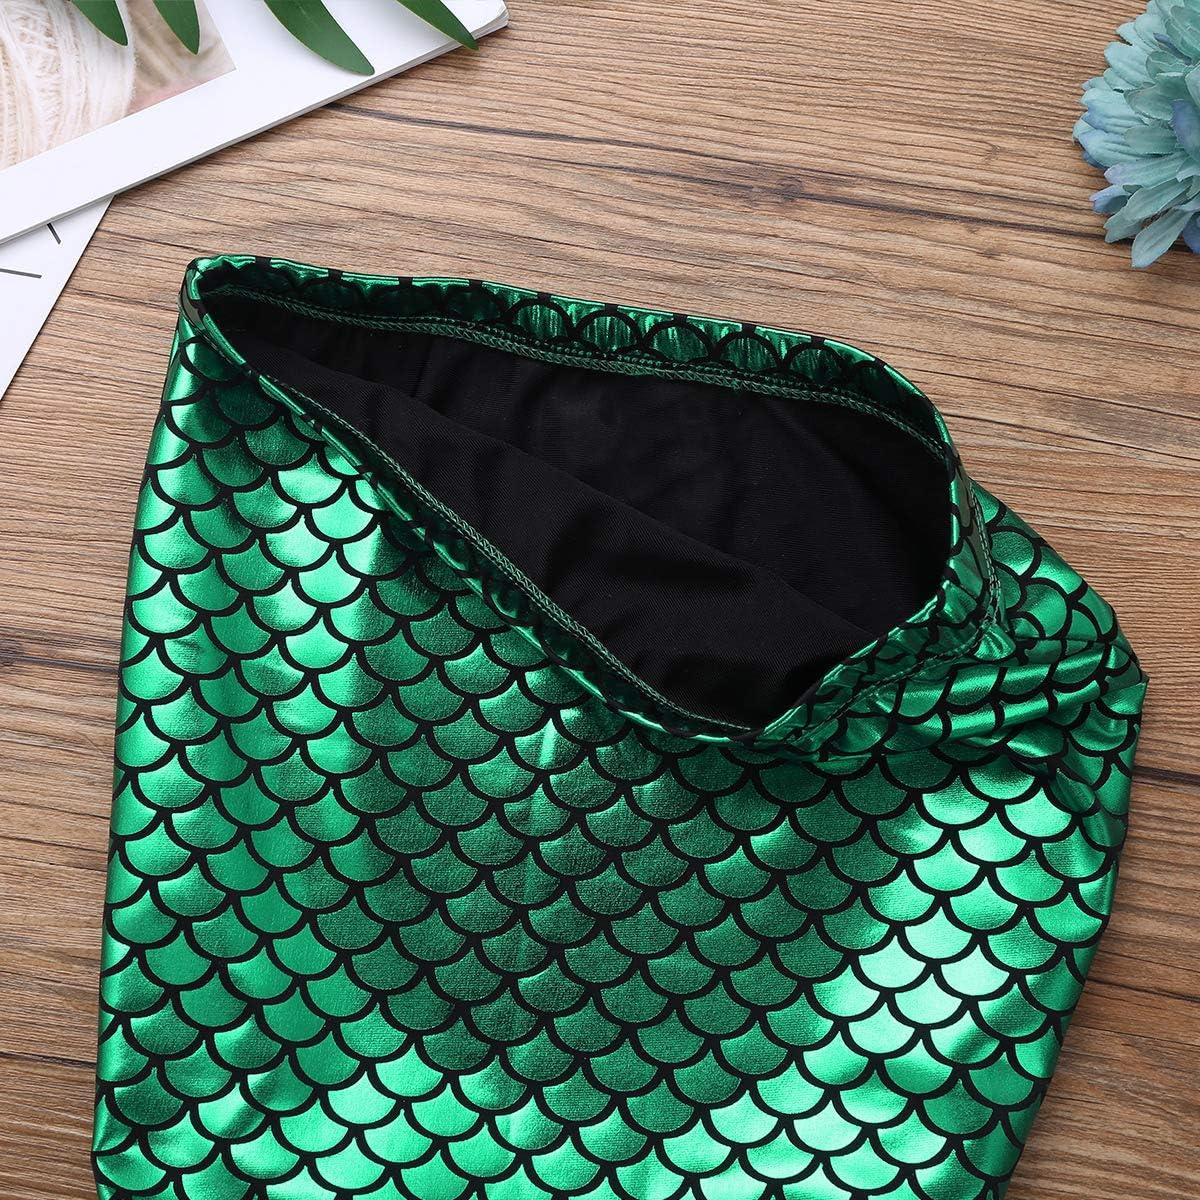 YONGHS Kids Girls Glossy Fish Scale Printed Mermaid Tail Walkable Skirt Costume for Halloween Cosplay Carnival